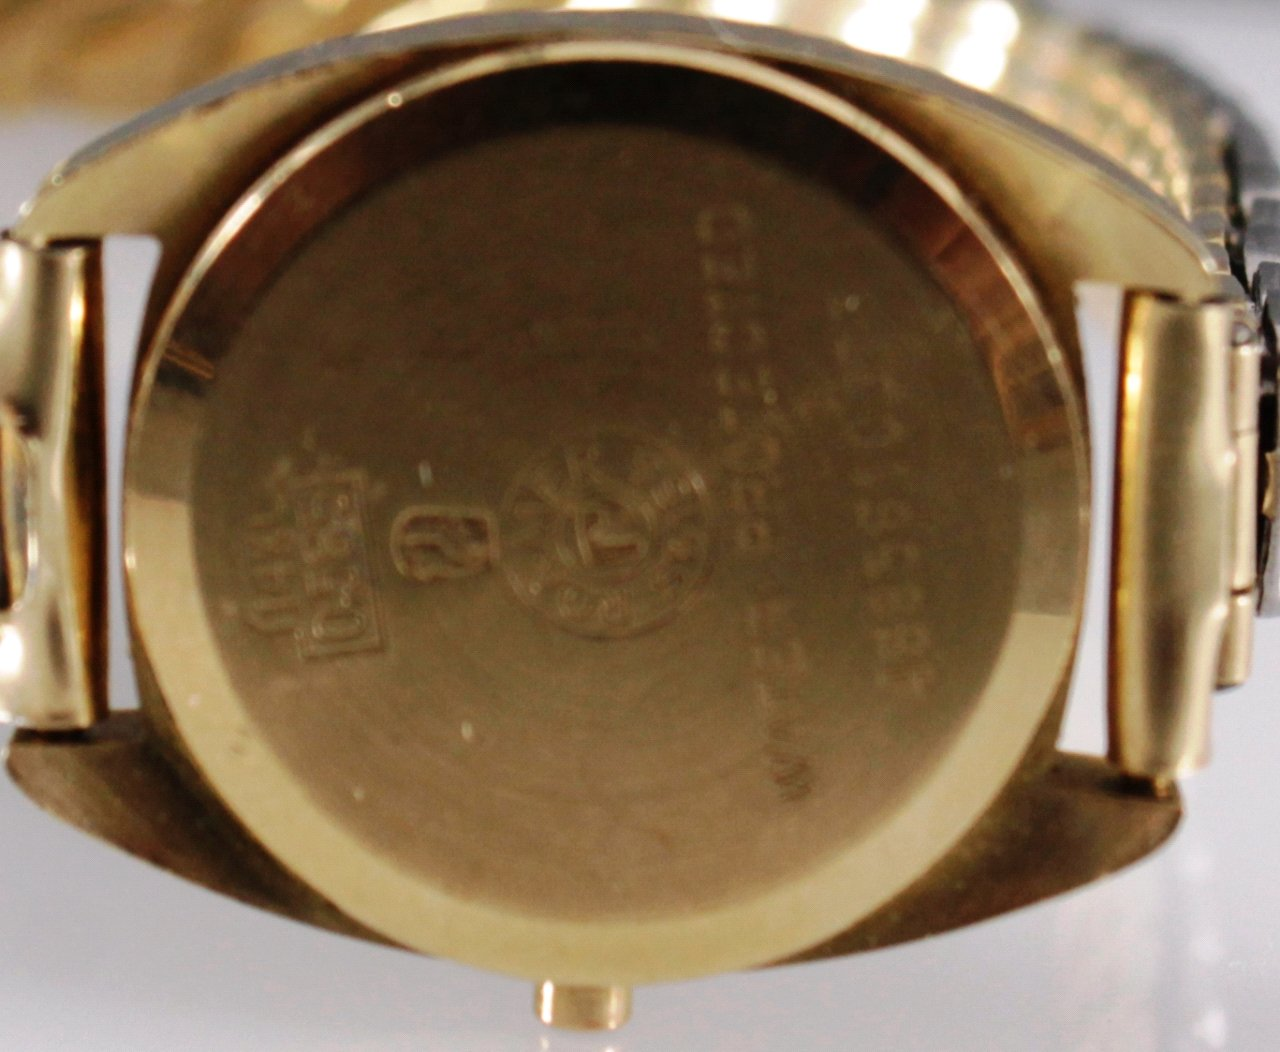 Roamer Damenarmbanduhr, 14kt Gelbgold-1